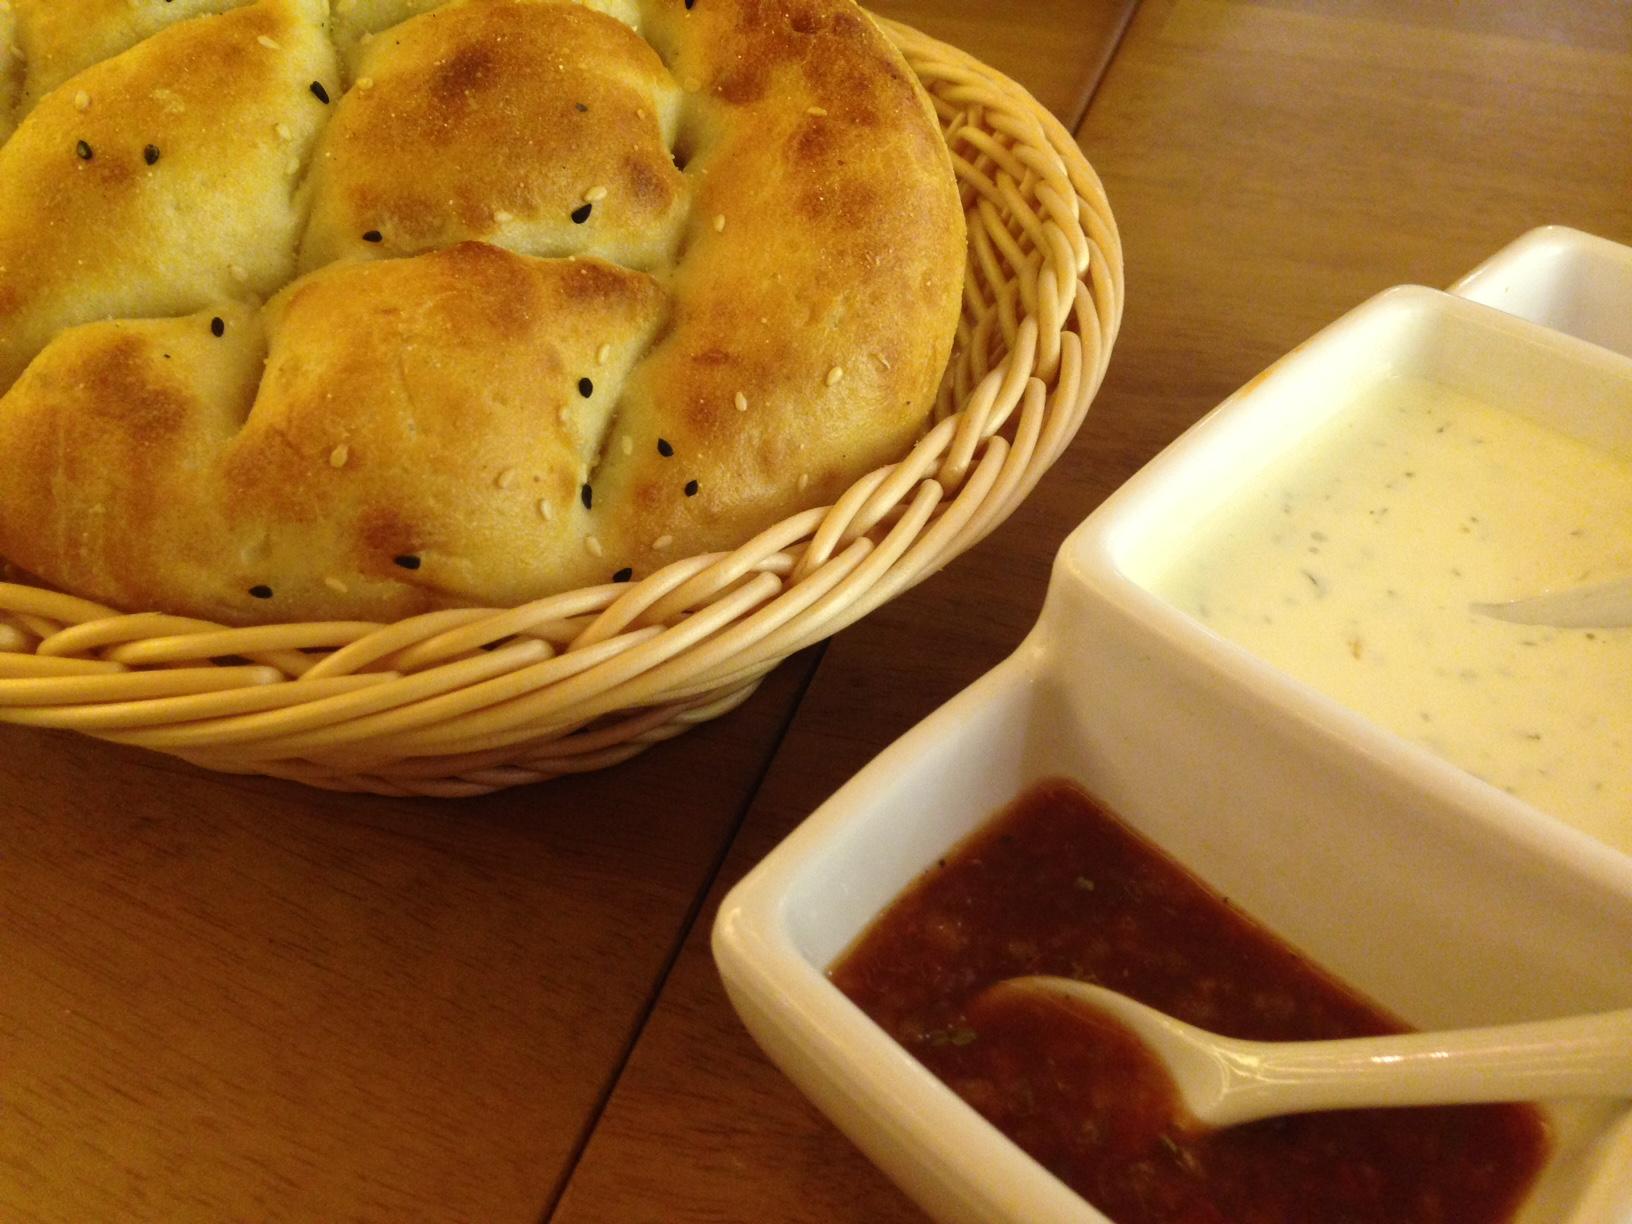 Authentieke turkse keuken strijkt neer in bolo boloboost for Meram cafe oost